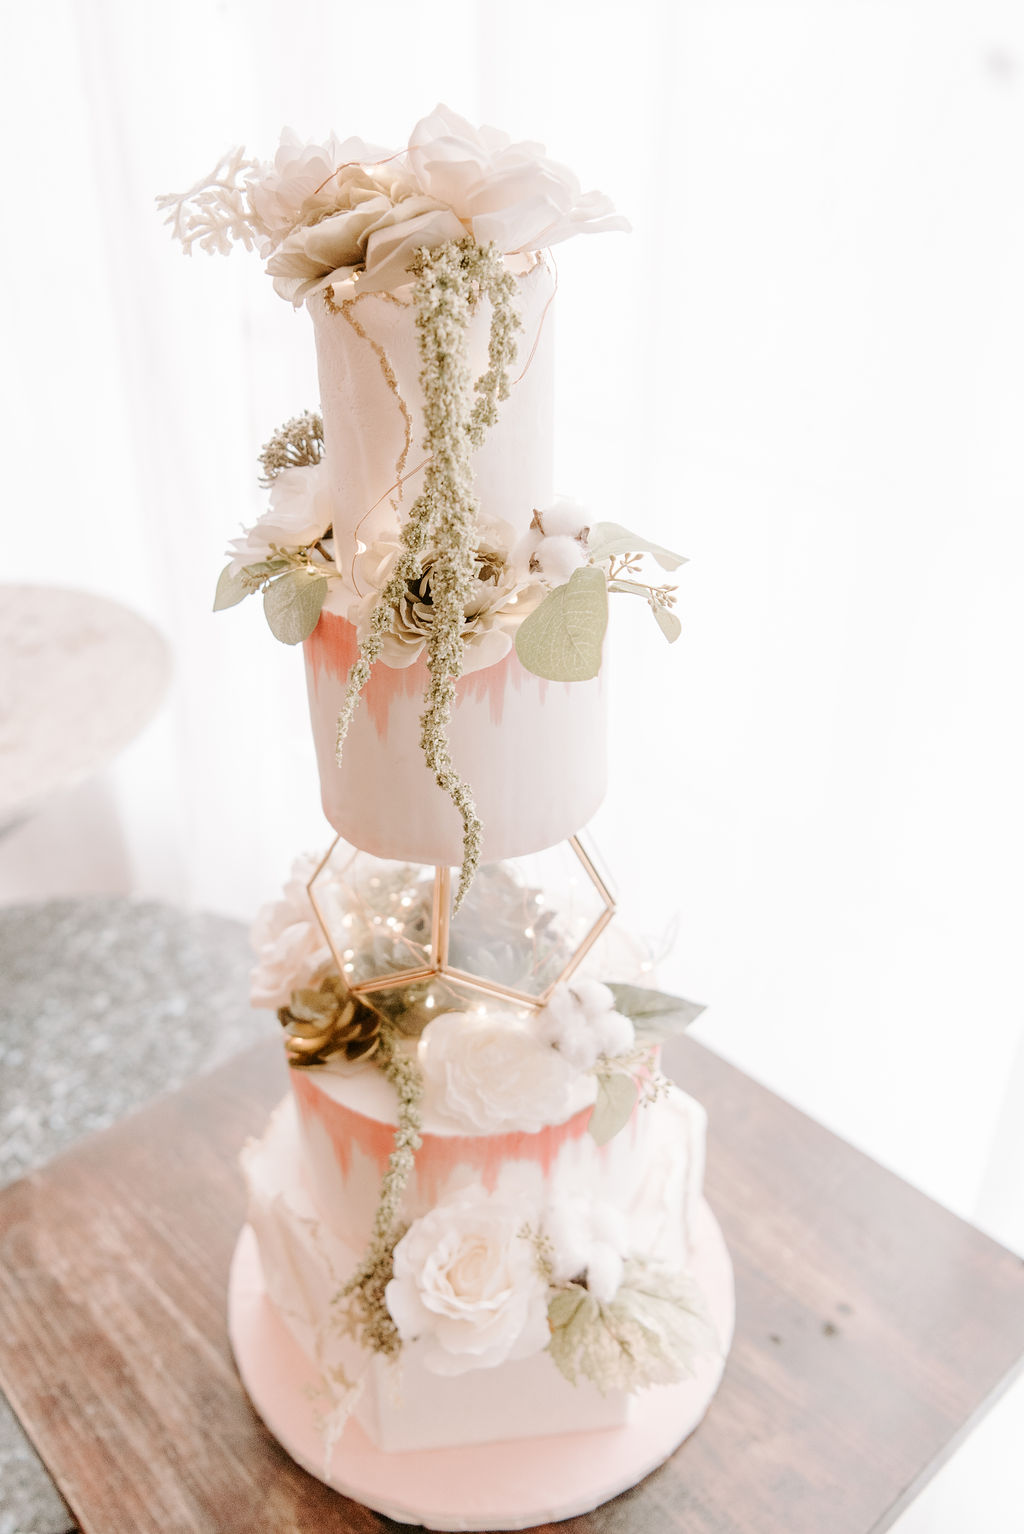 Industrial Chic Wedding Cake